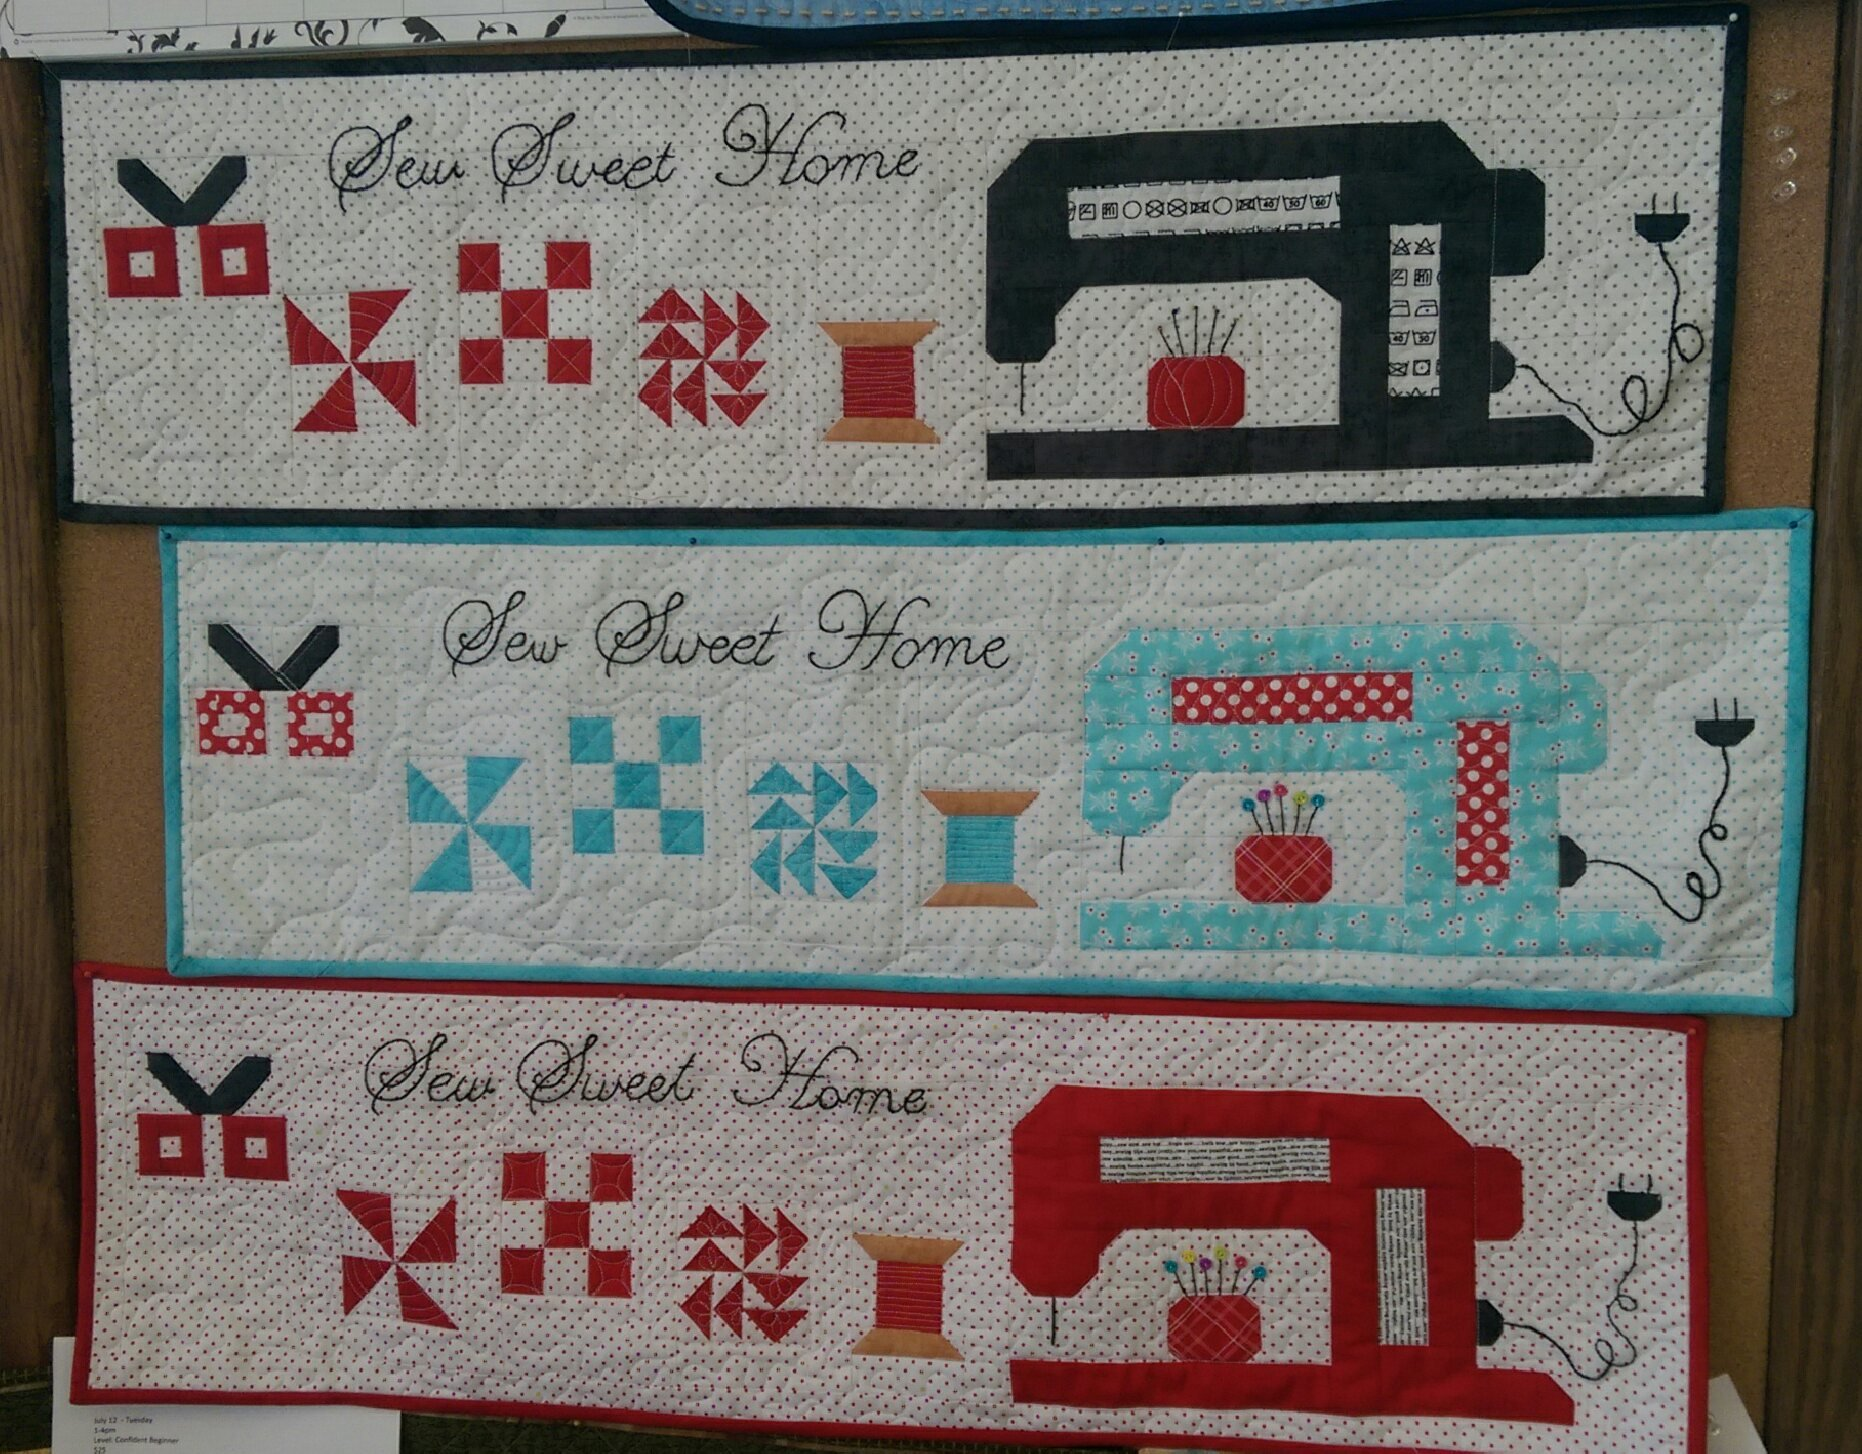 Sew Sweet Home 2016 RxR Pattern (Download)